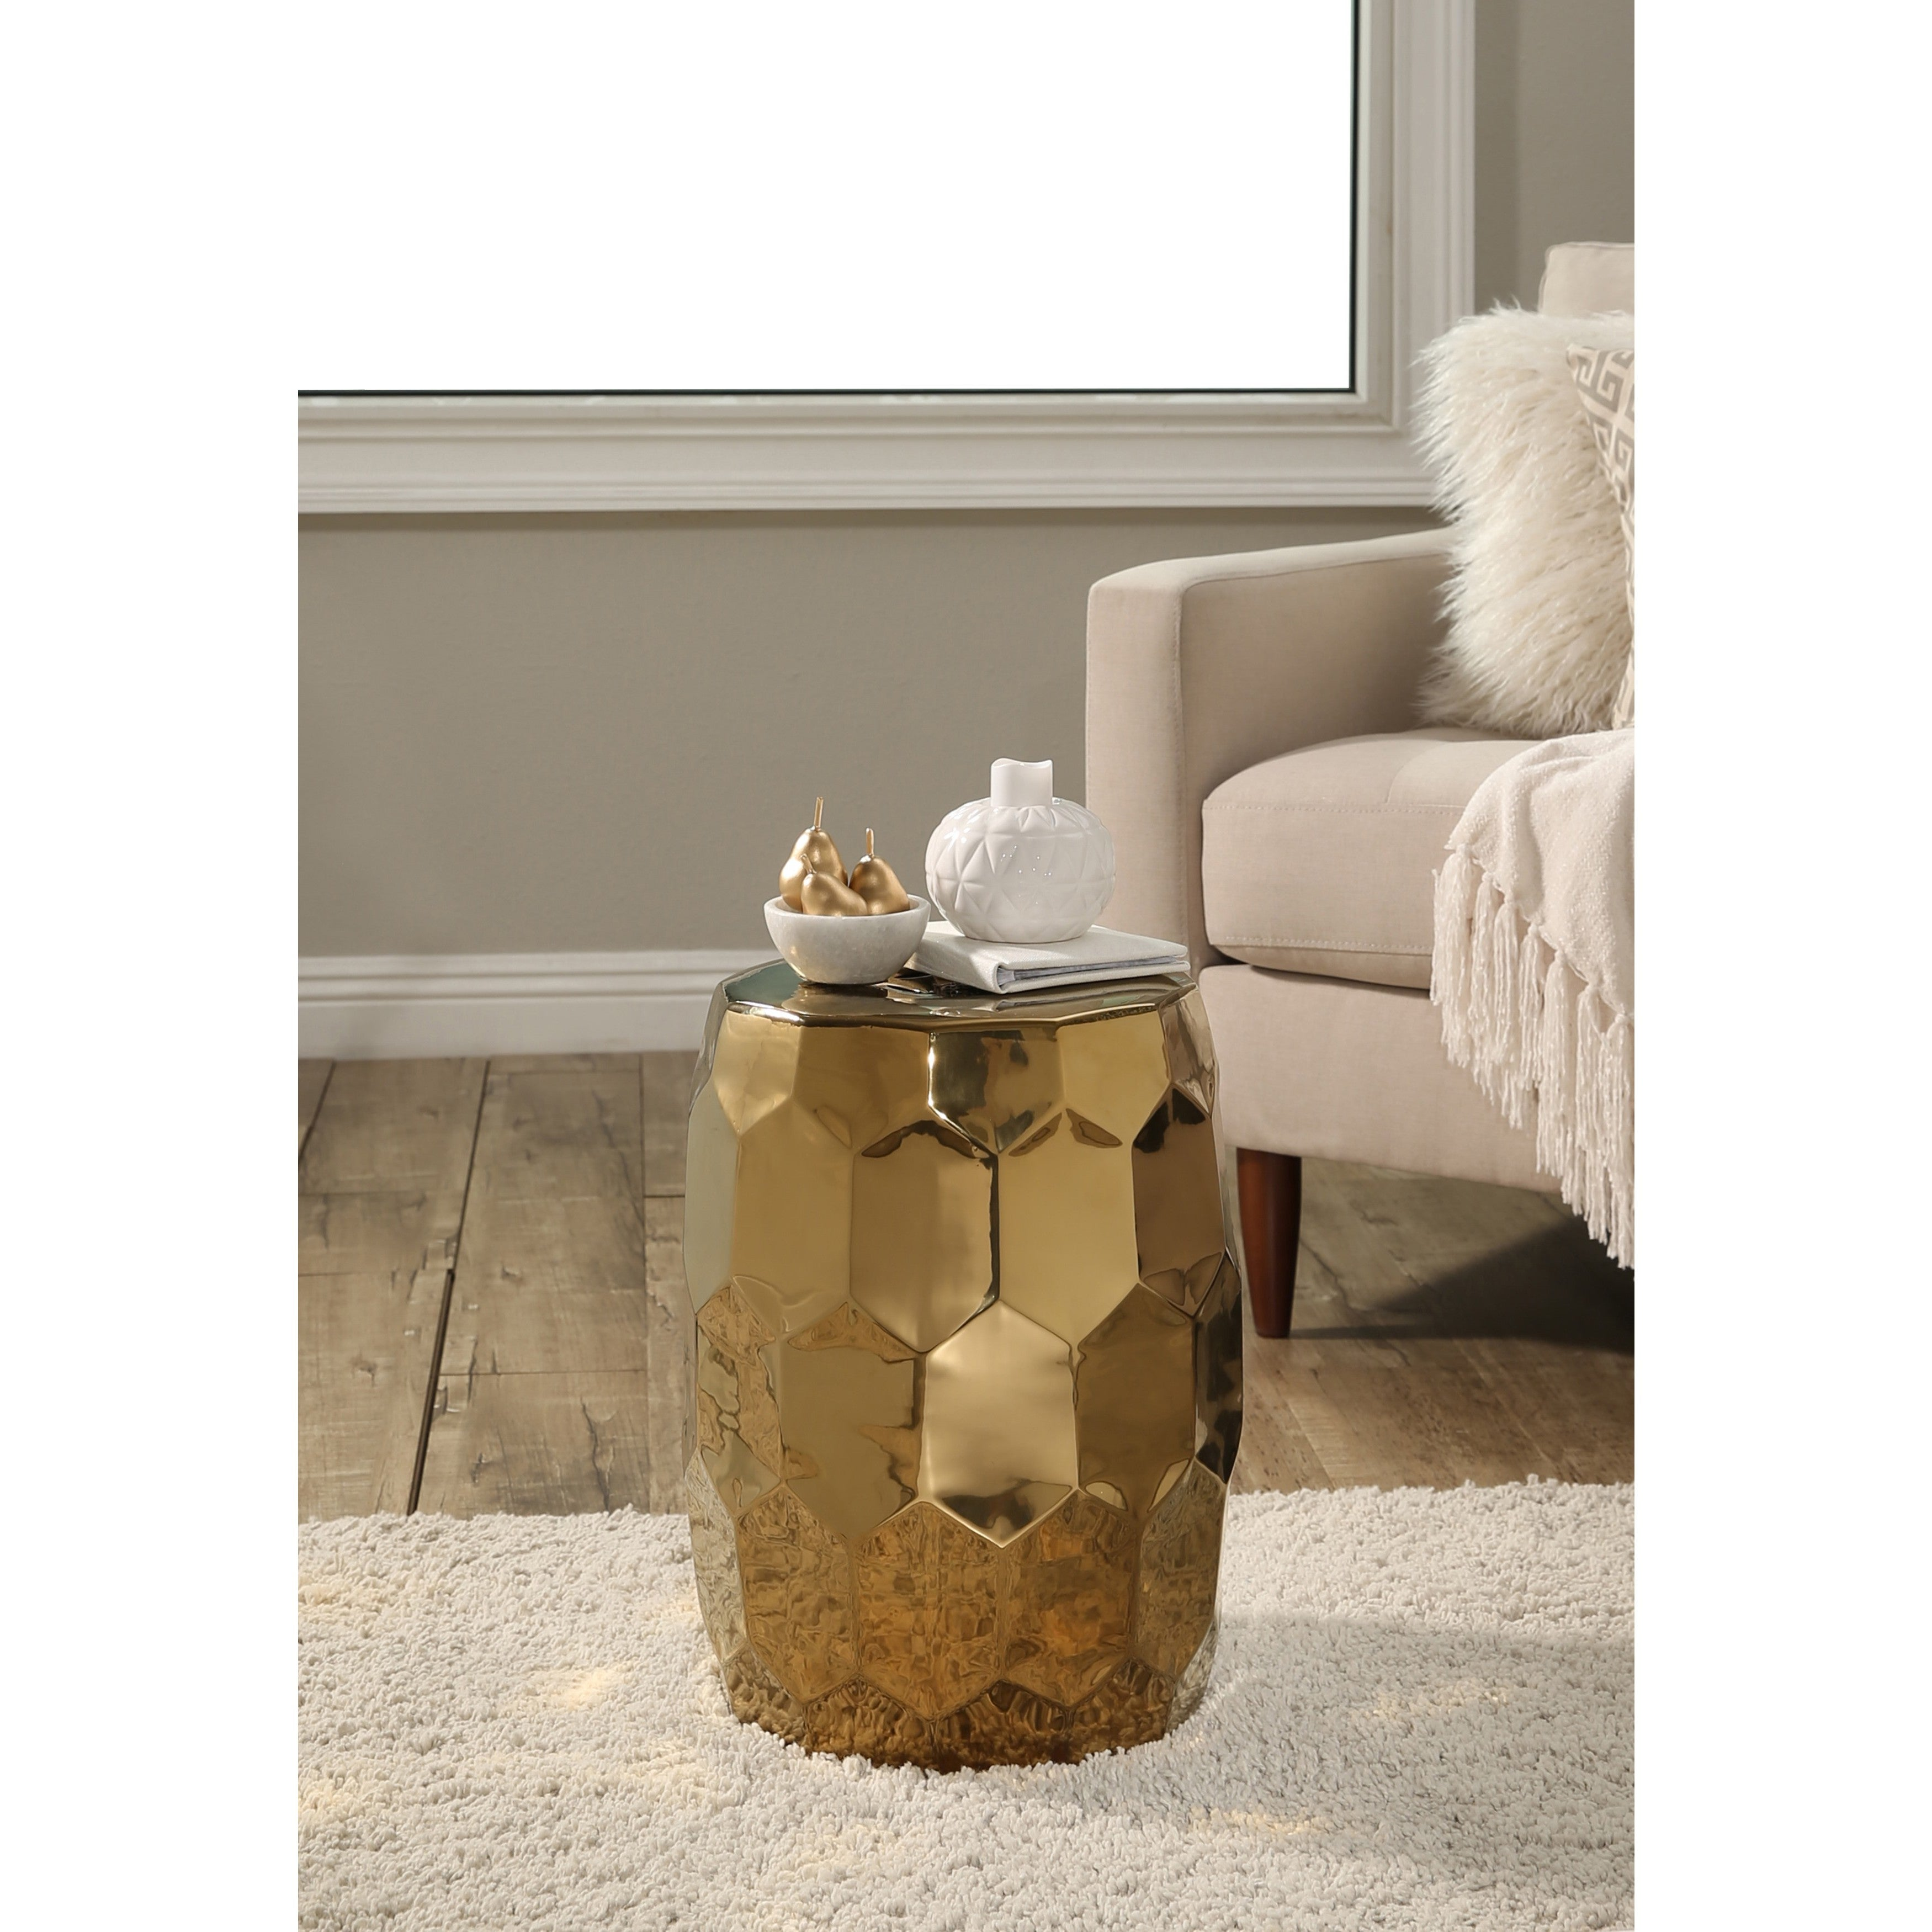 Shop Abbyson Milan Gold Chrome Ceramic Garden Stool - On Sale - Free ...